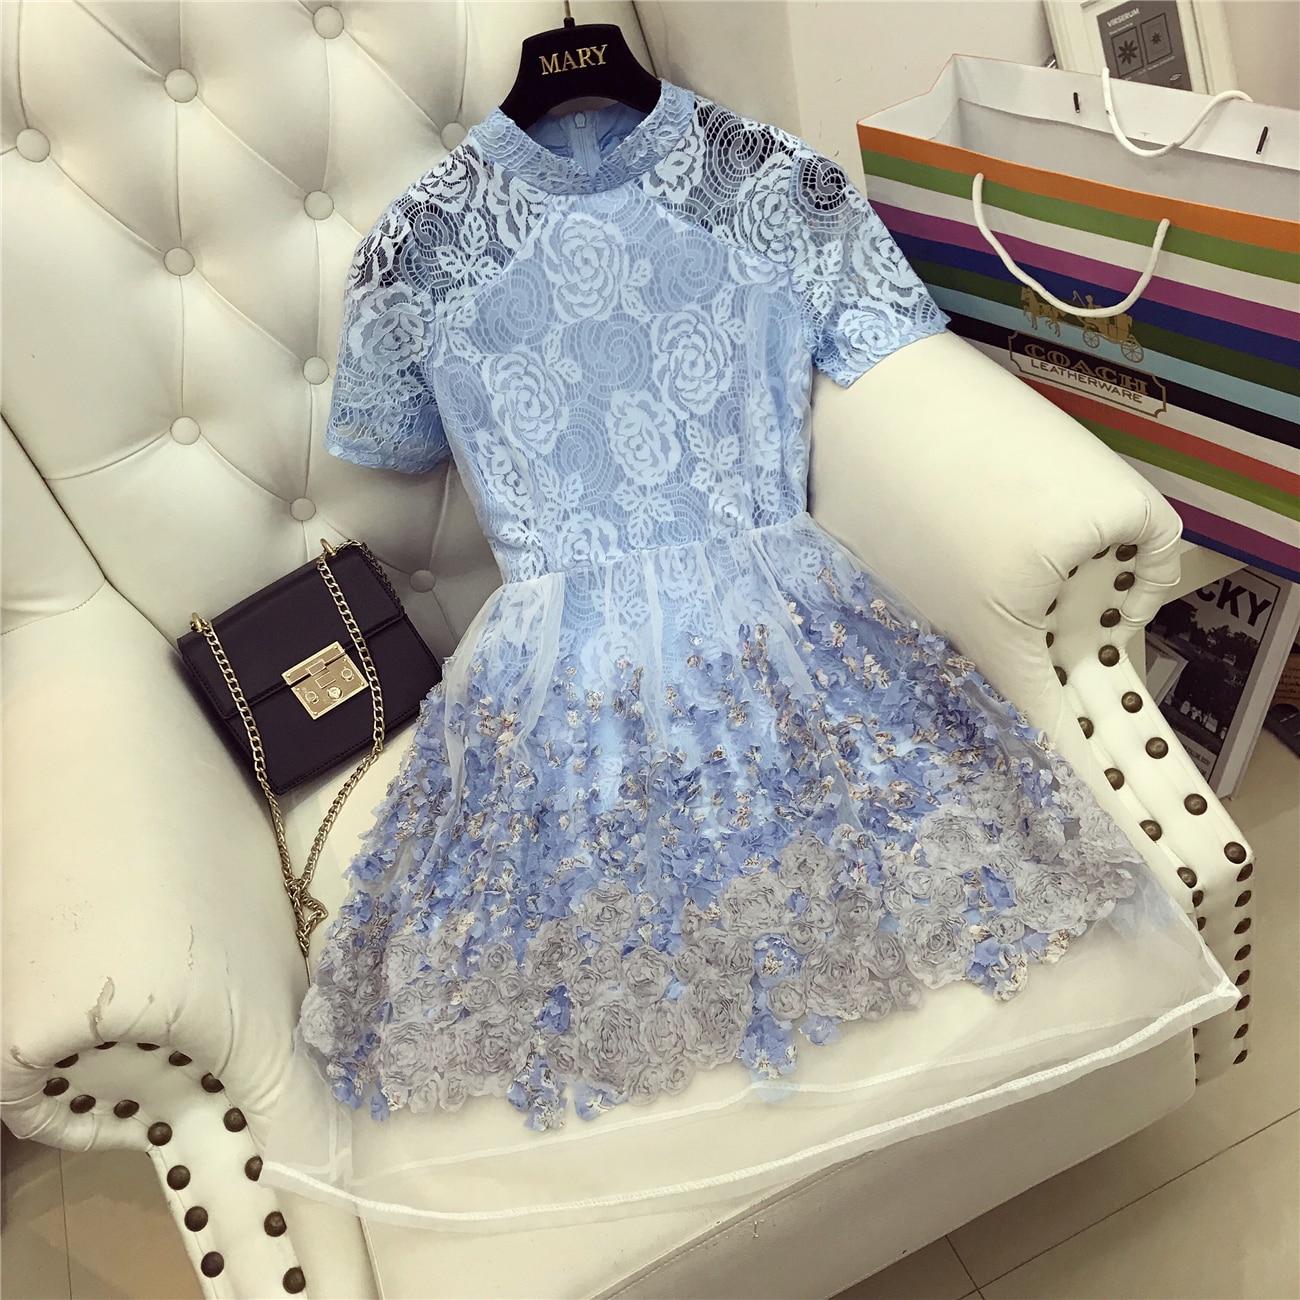 2018 New Oganza Fairy Vintage Lace Dress Women Turtleneck Perspective Three-dimensional Flower Mini Dress Students Blue Vestidos